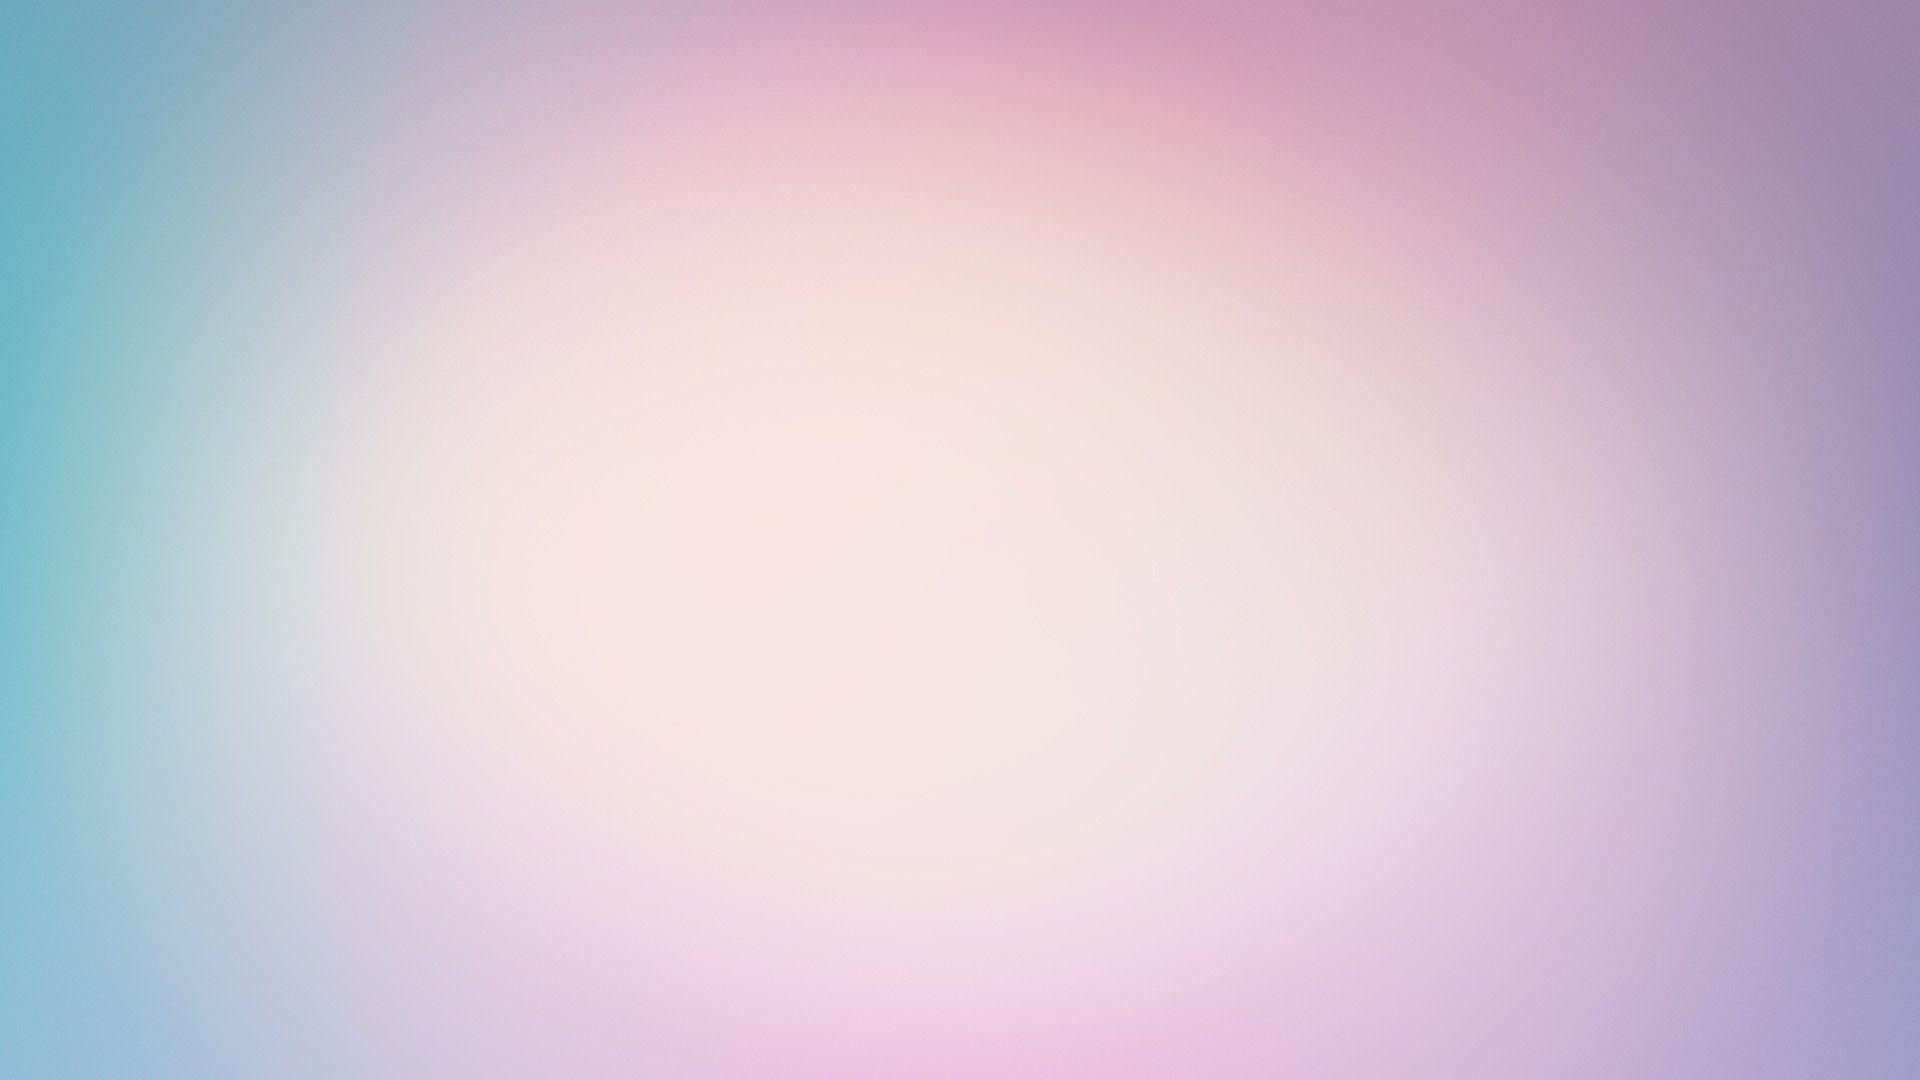 Calm Desktop Wallpaper Colors In 2019 Solid Color